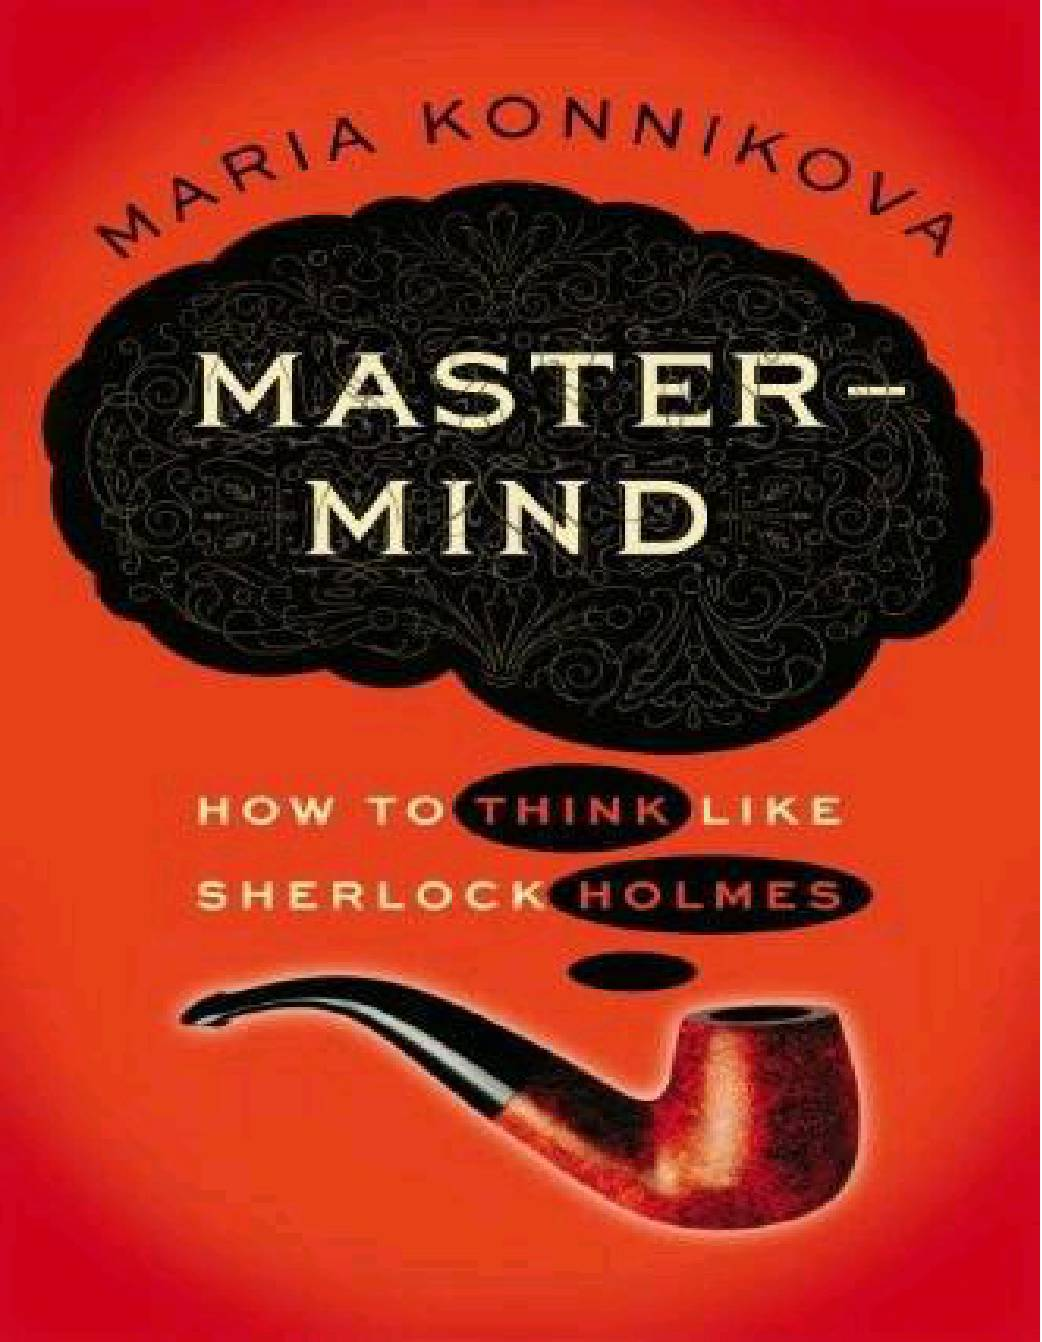 Mastermind How To Think Like Sherlock Holmes Pdf Docdroid